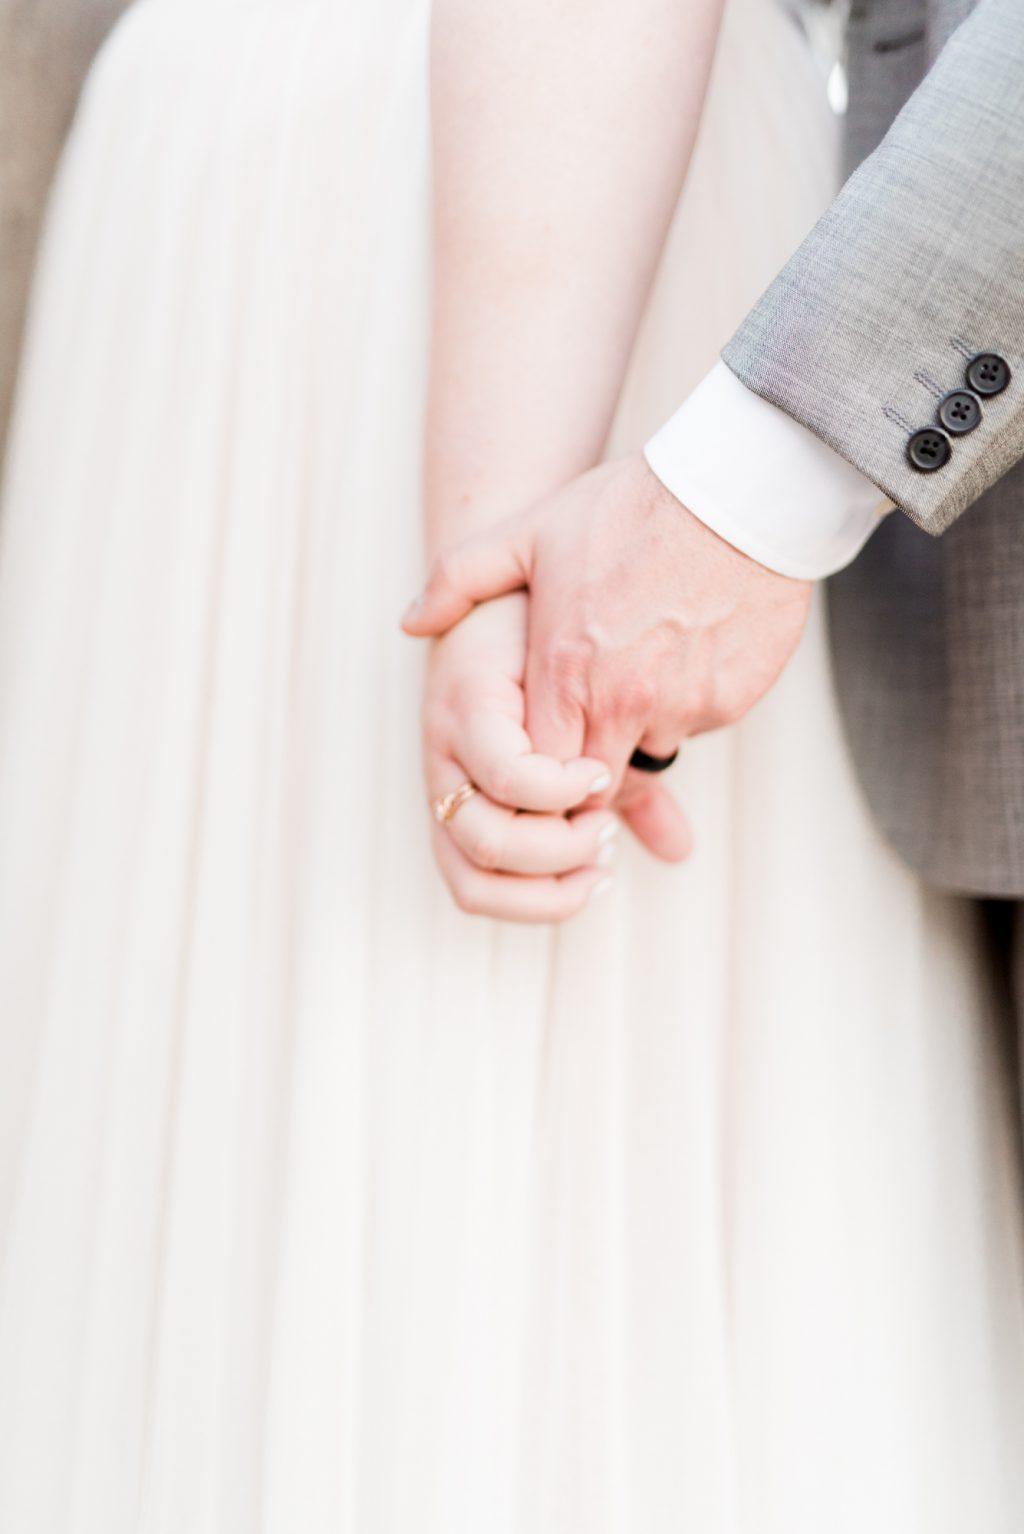 haley-richter-photo-west-chester-summer-wedding-boxcar-brewery-197